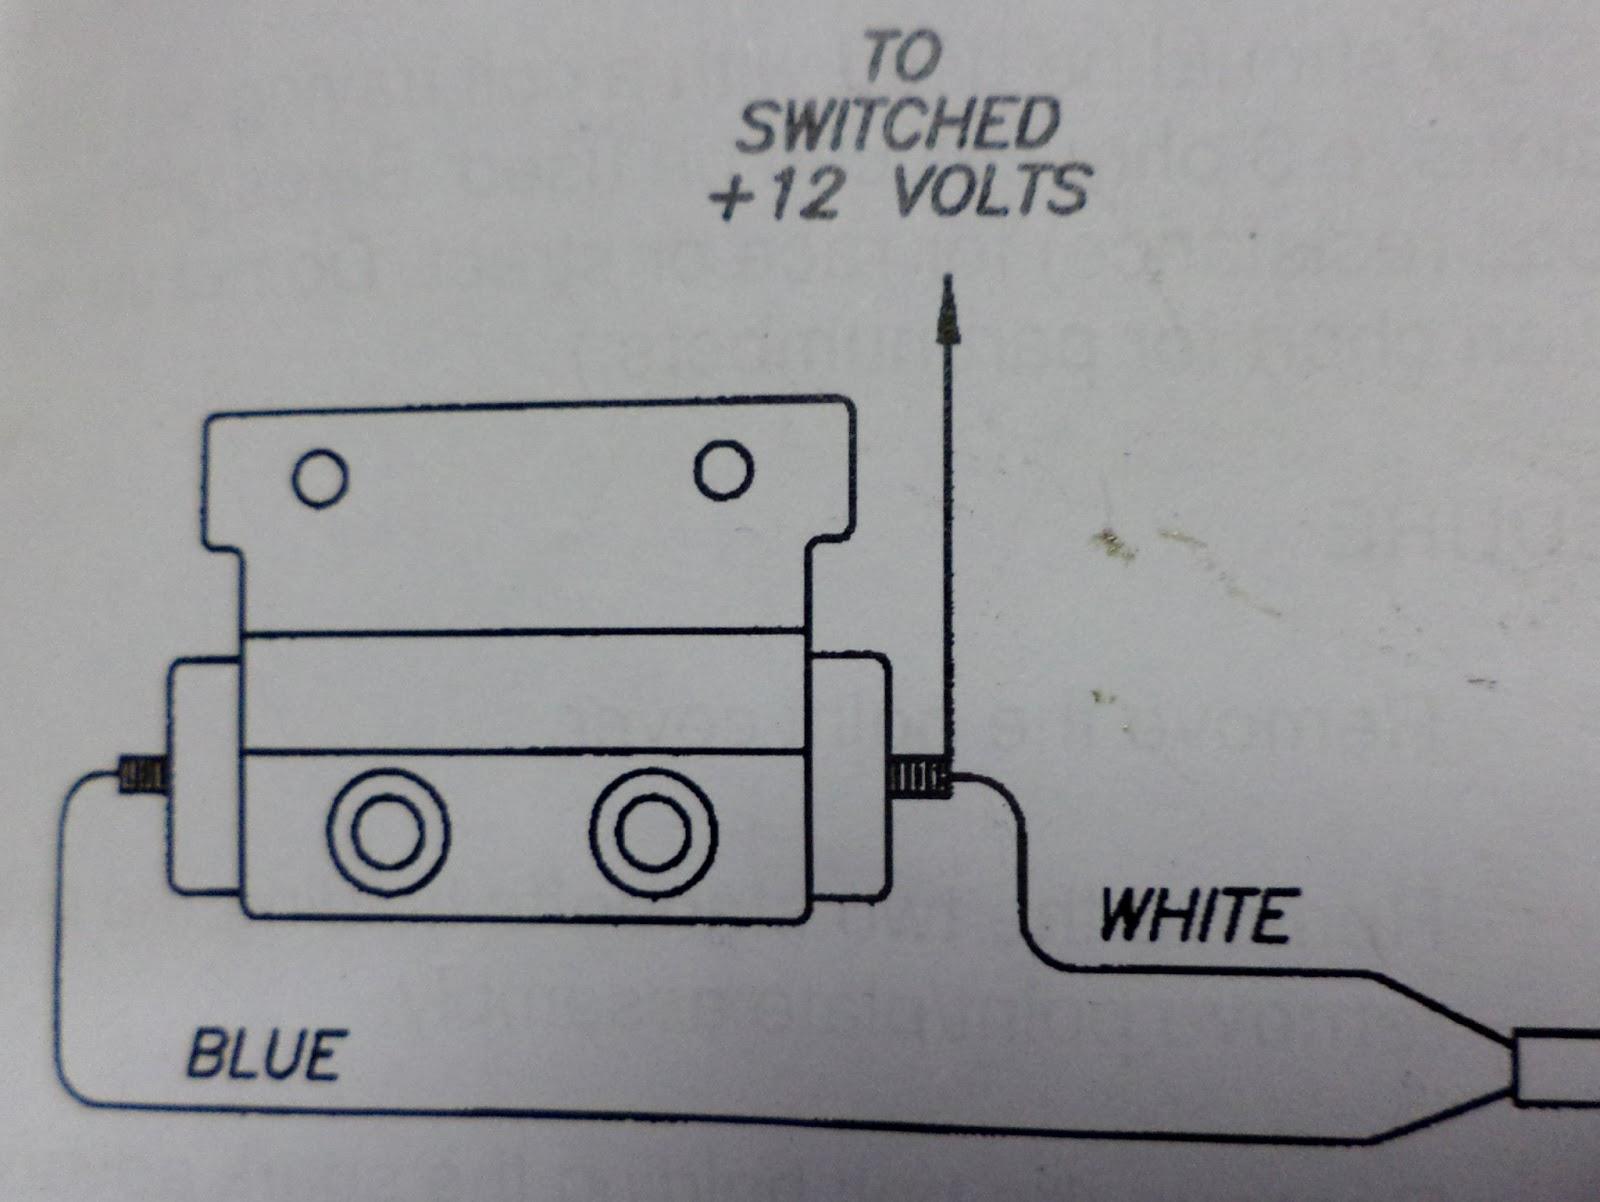 √ dyna single fire wiring diagram dyna s ignition wiring schematic harley oil temp gauge wiring diagram harley dyna single fire wiring diagram wiring library harley shovelhead engine blueprint, harley, free engine